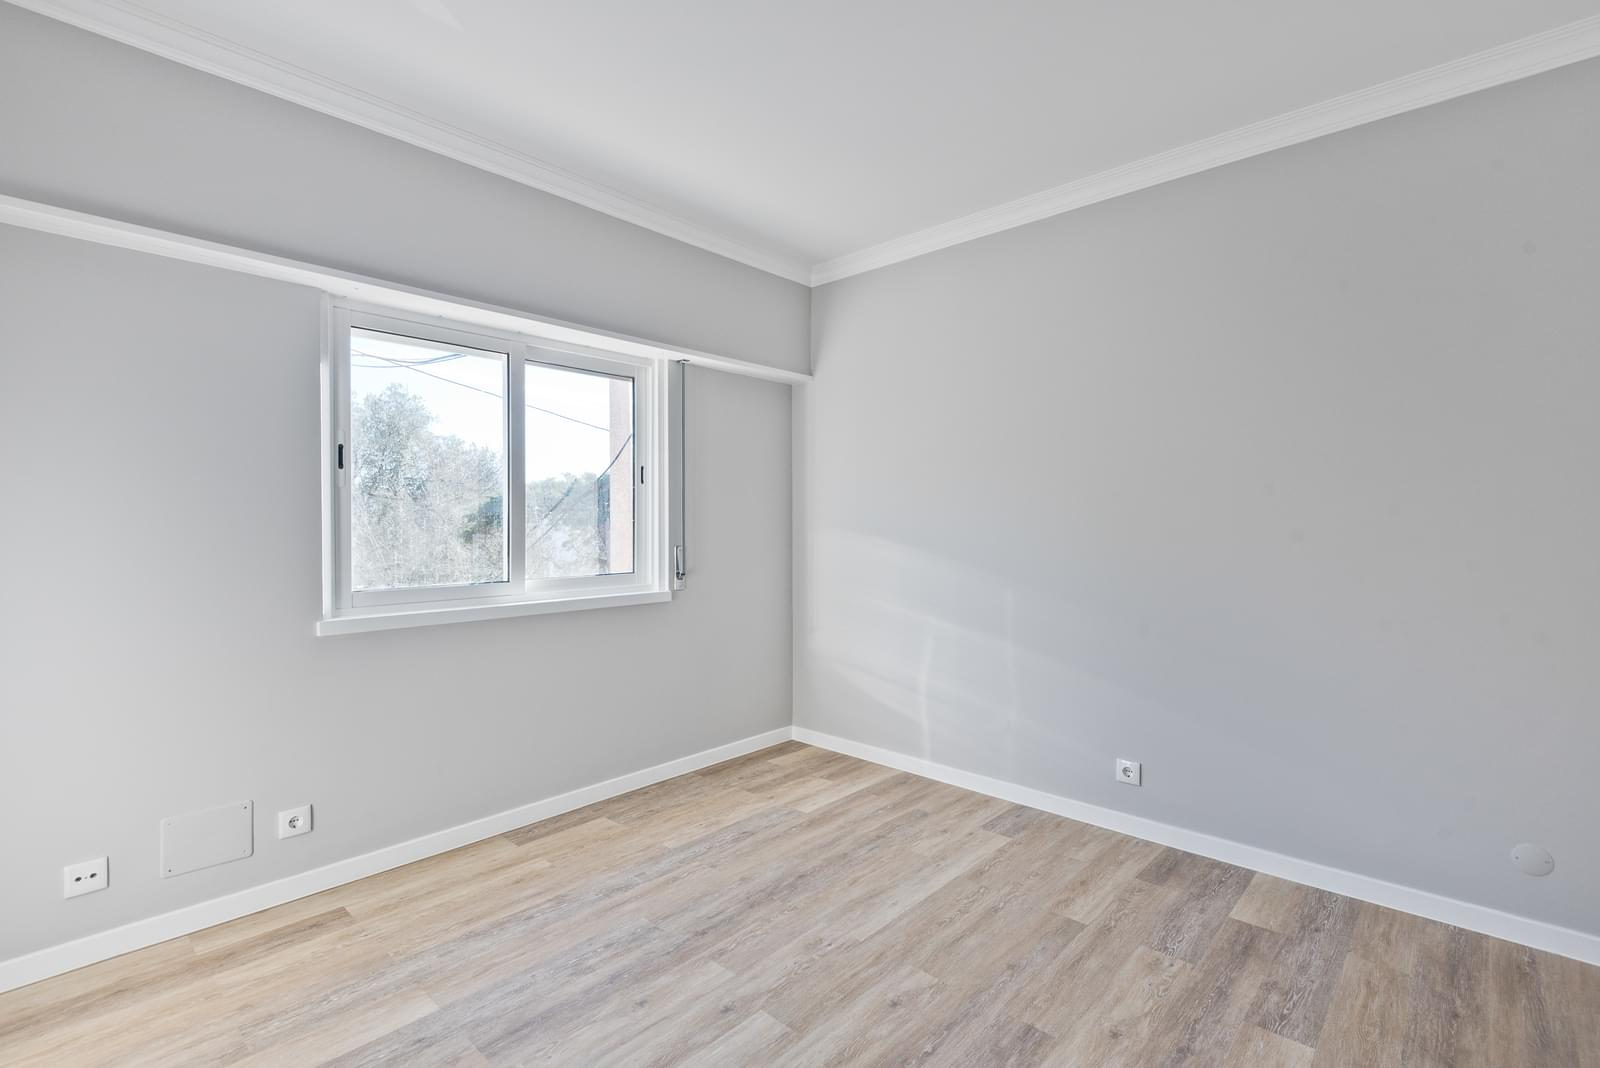 pf18907-apartamento-t2-cascais-e1118ea4-6acc-4eb0-8040-f7f8b4c7a210